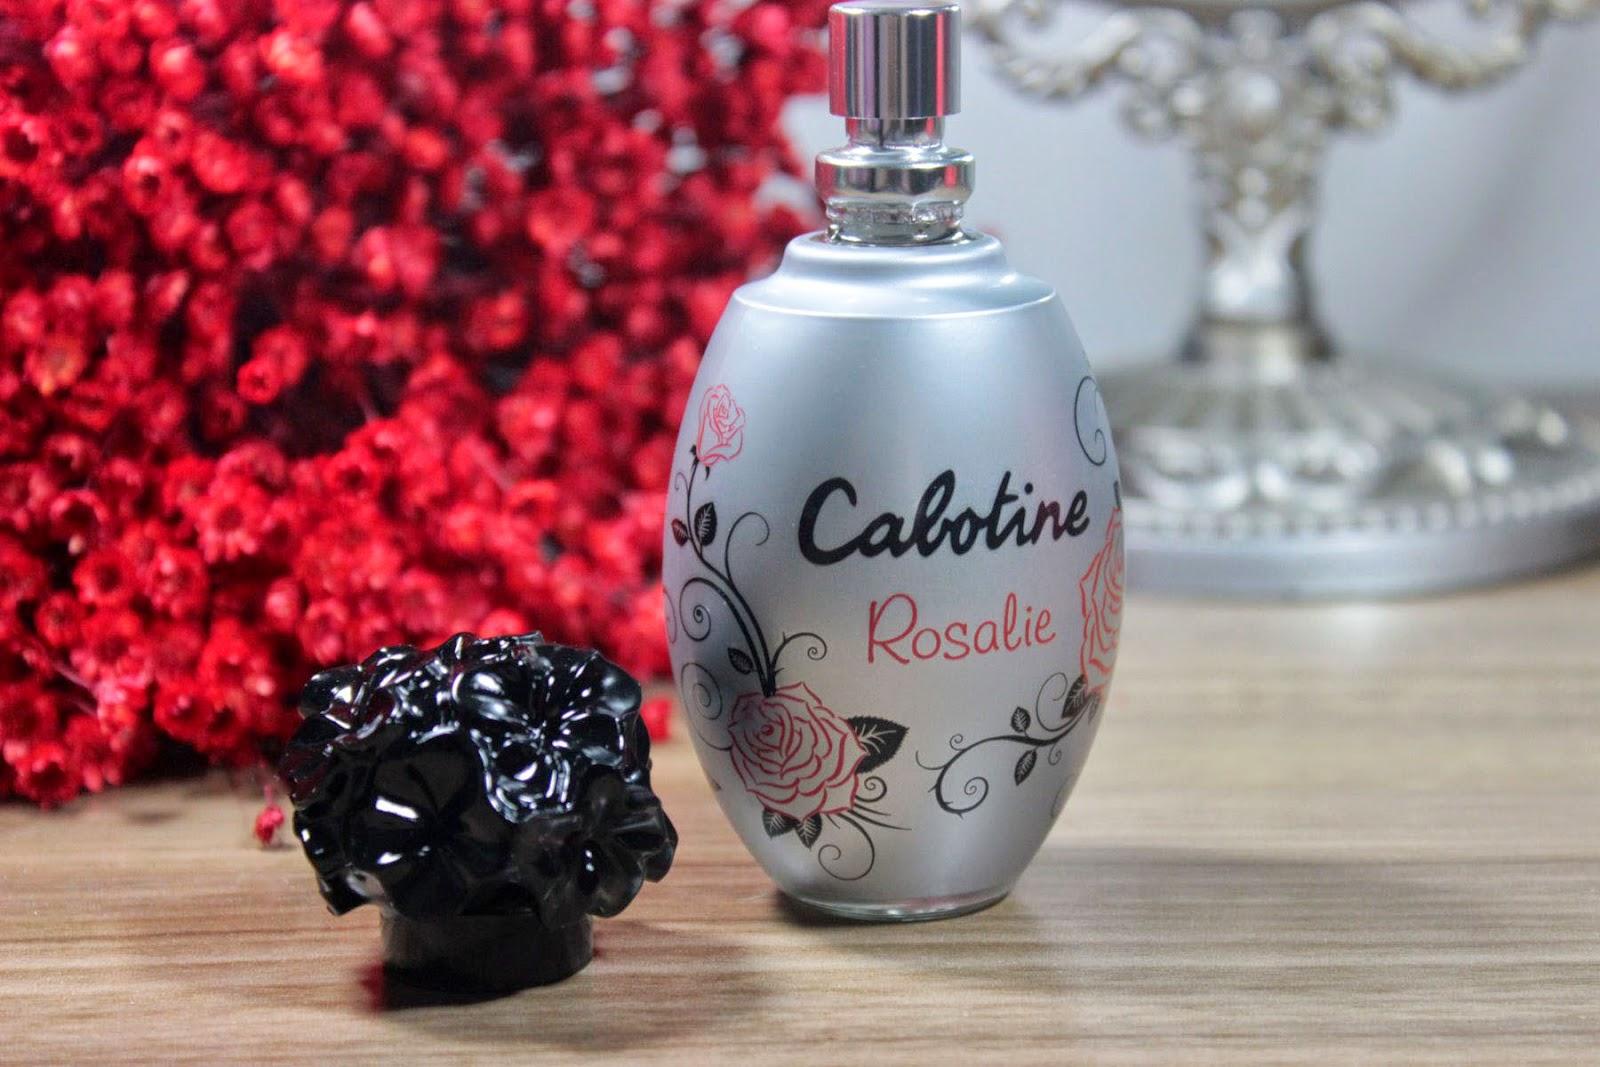 eau de toilette, perfume, floral, cítrico, presente, sugestão, delicado